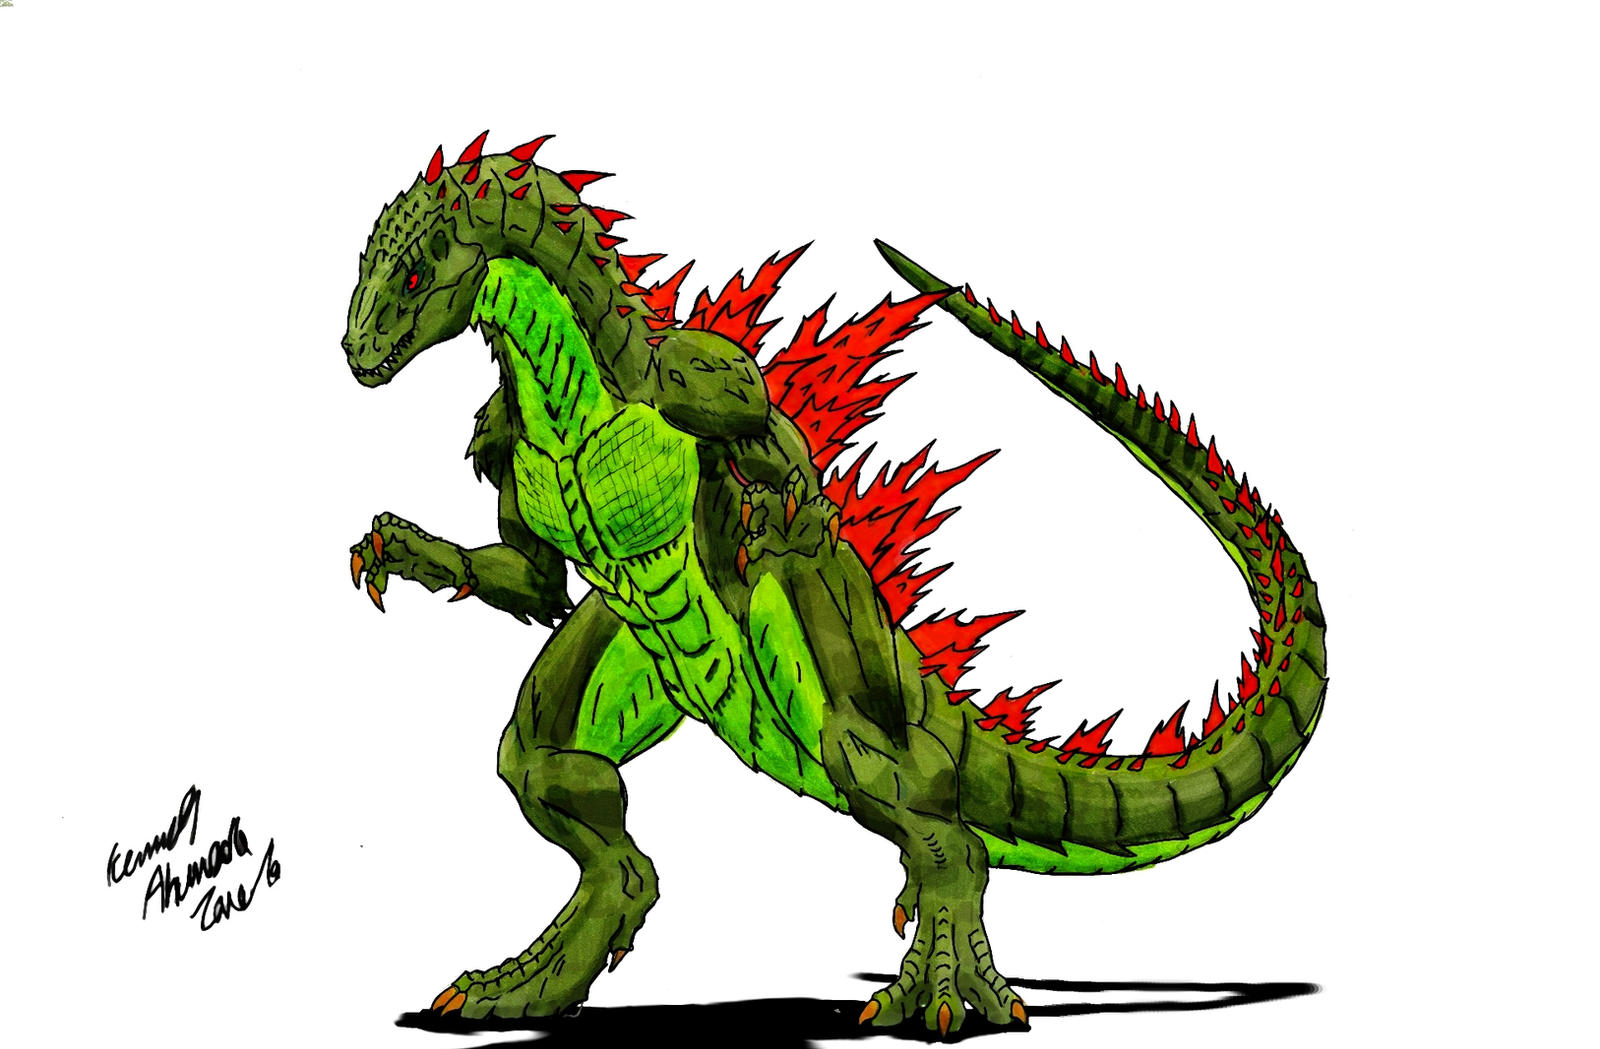 http://fc00.deviantart.net/fs47/i/2009/235/e/e/Godzilla_by_Dino_master.jpg